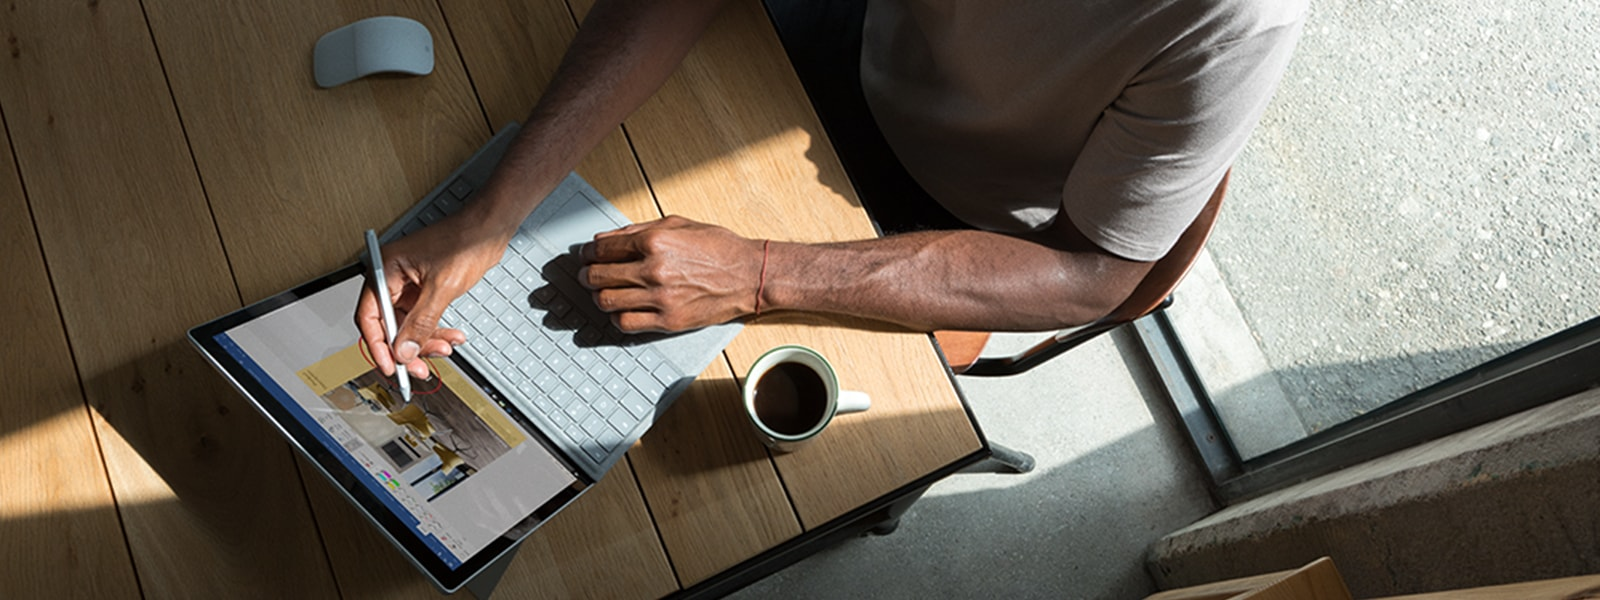 Hombre que usa el Lápiz para Surface en Surface JLTE, en un café.